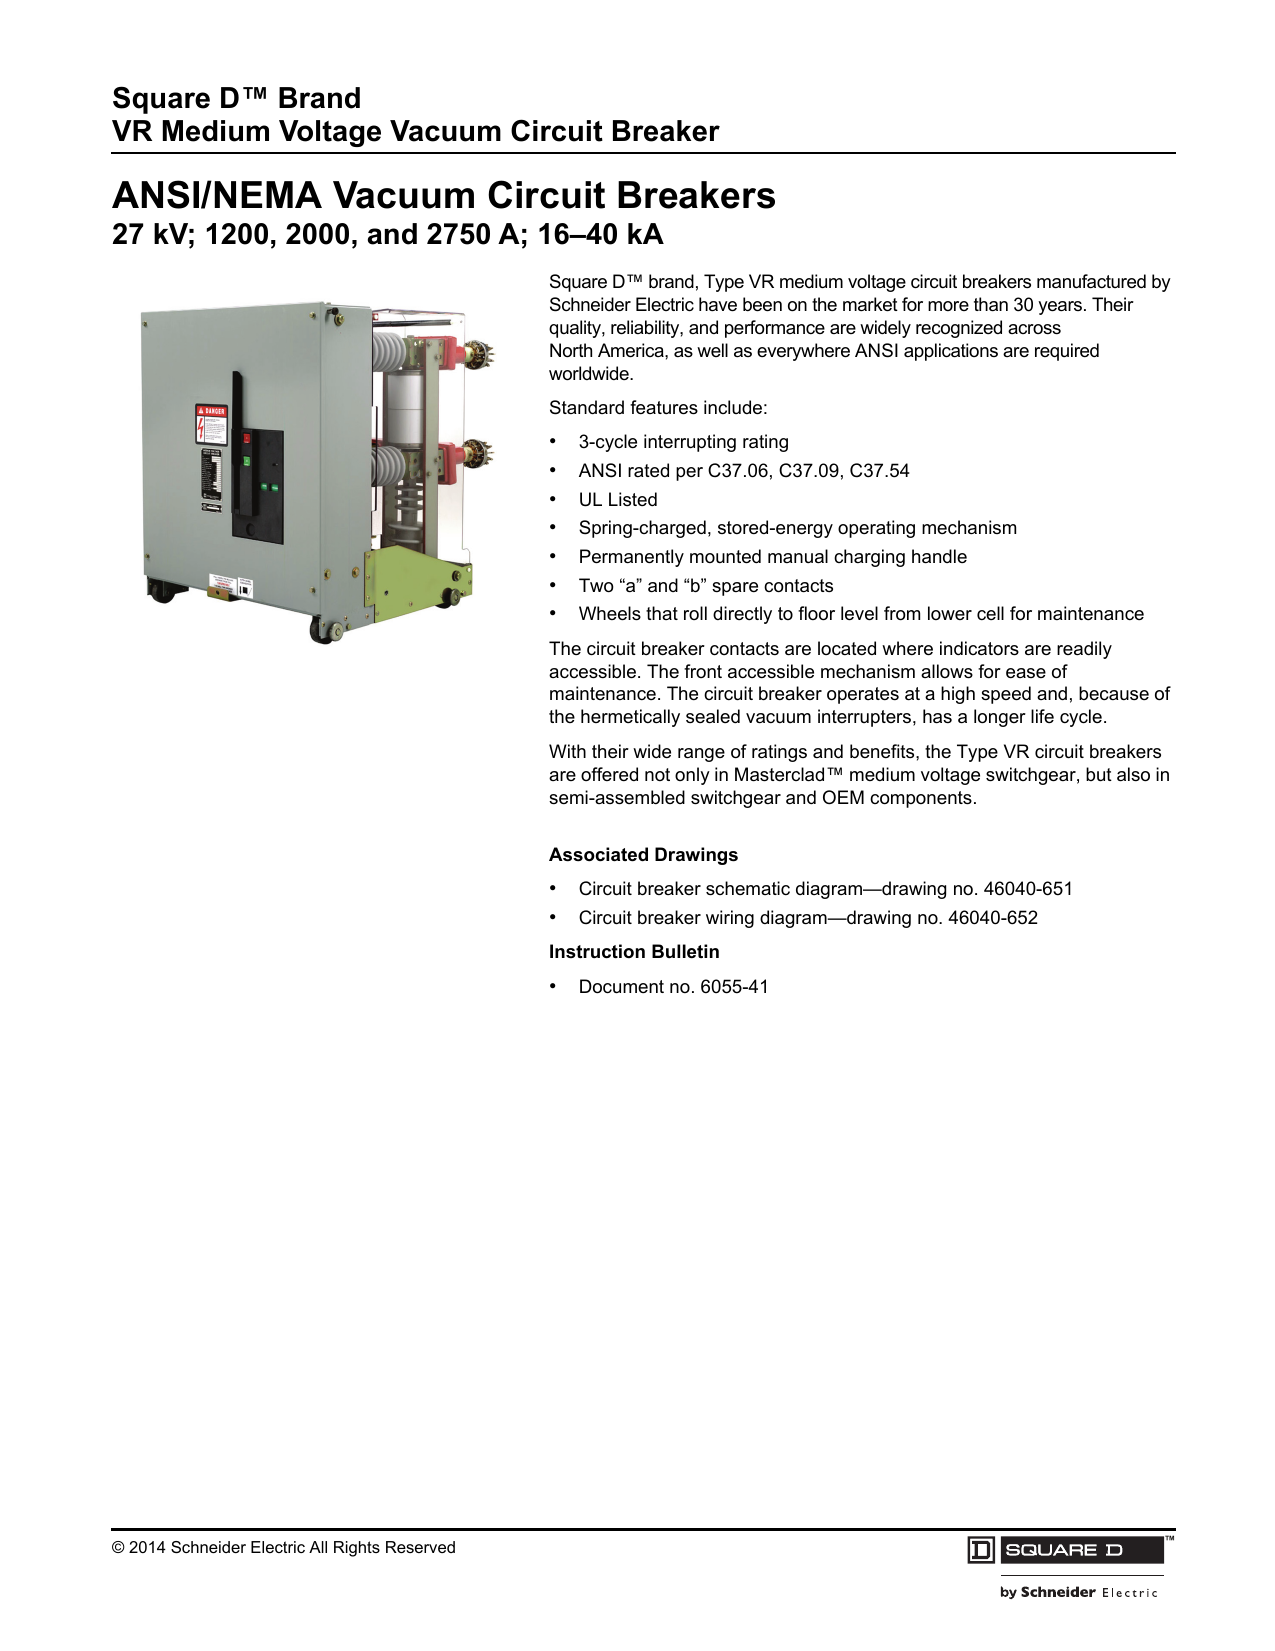 ANSI/NEMA Vacuum Circuit Breakers on